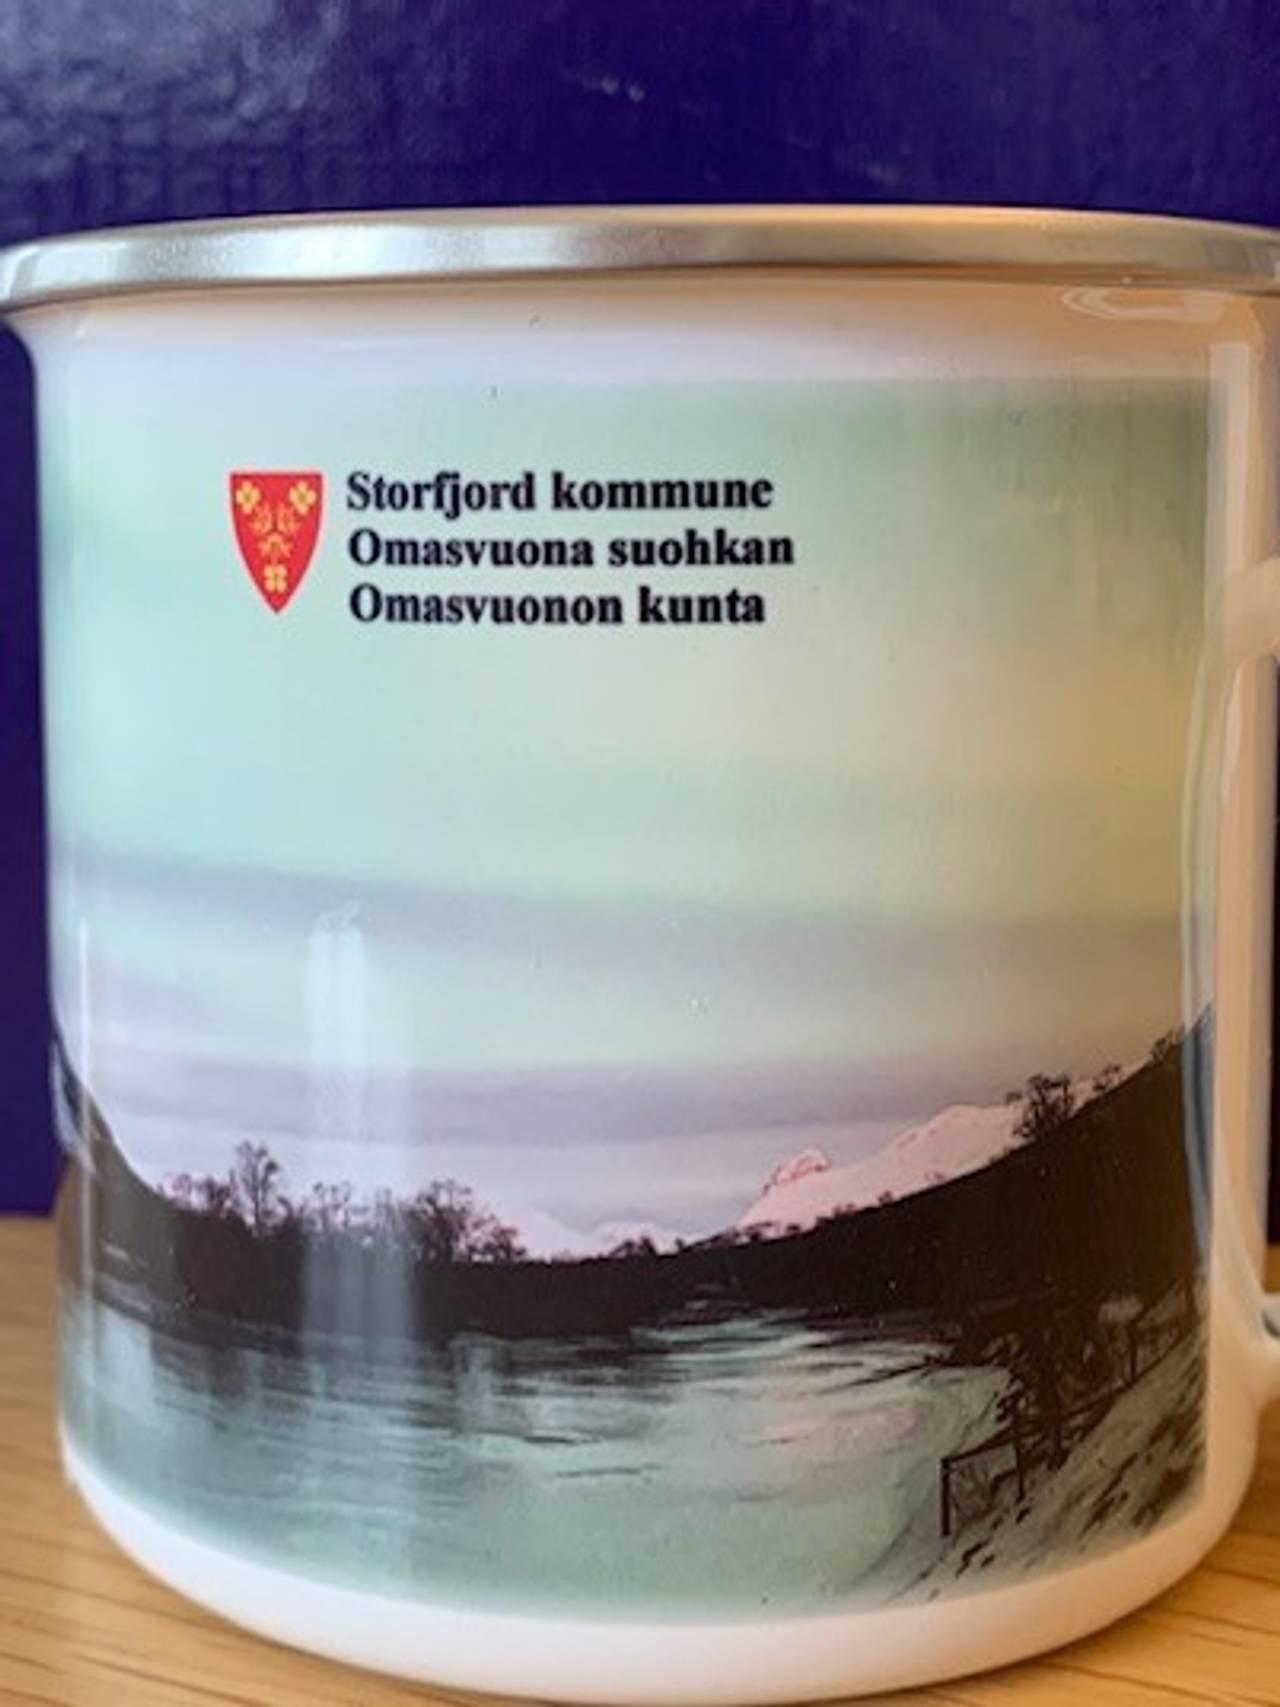 Storfjord kommune sitt krus